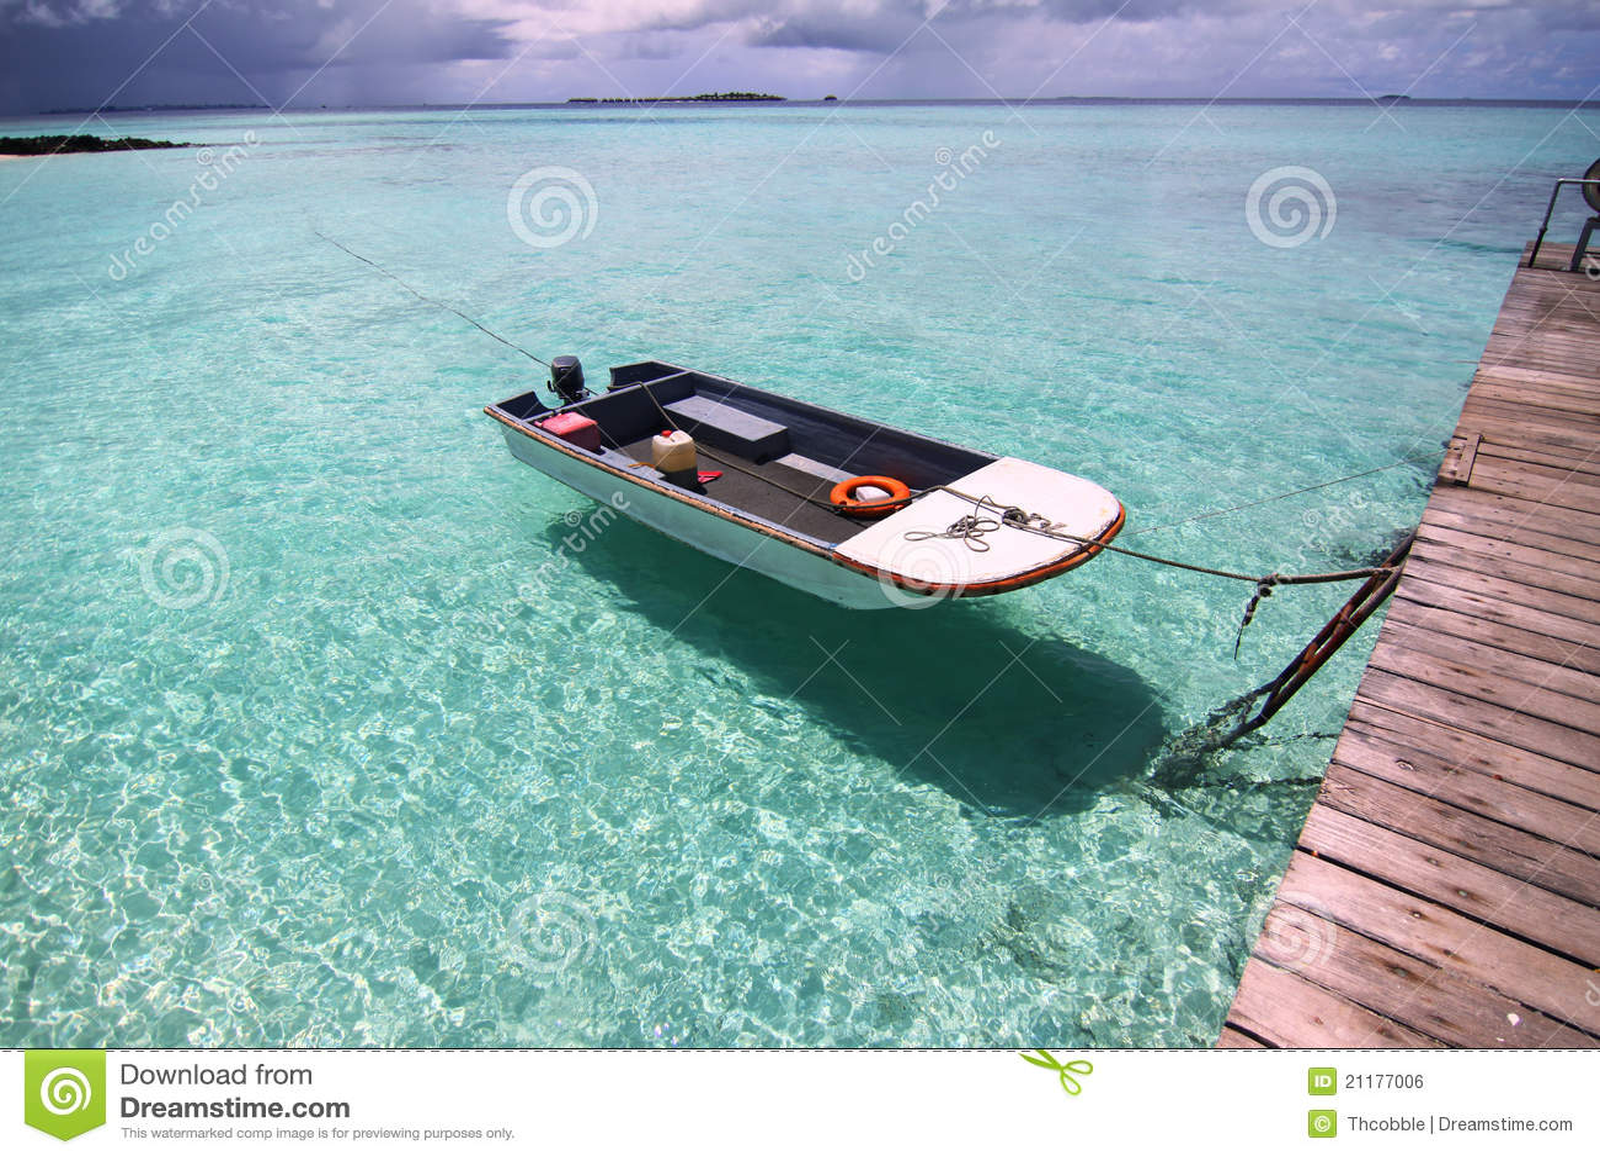 Floating boat on the blue sea, Maldives